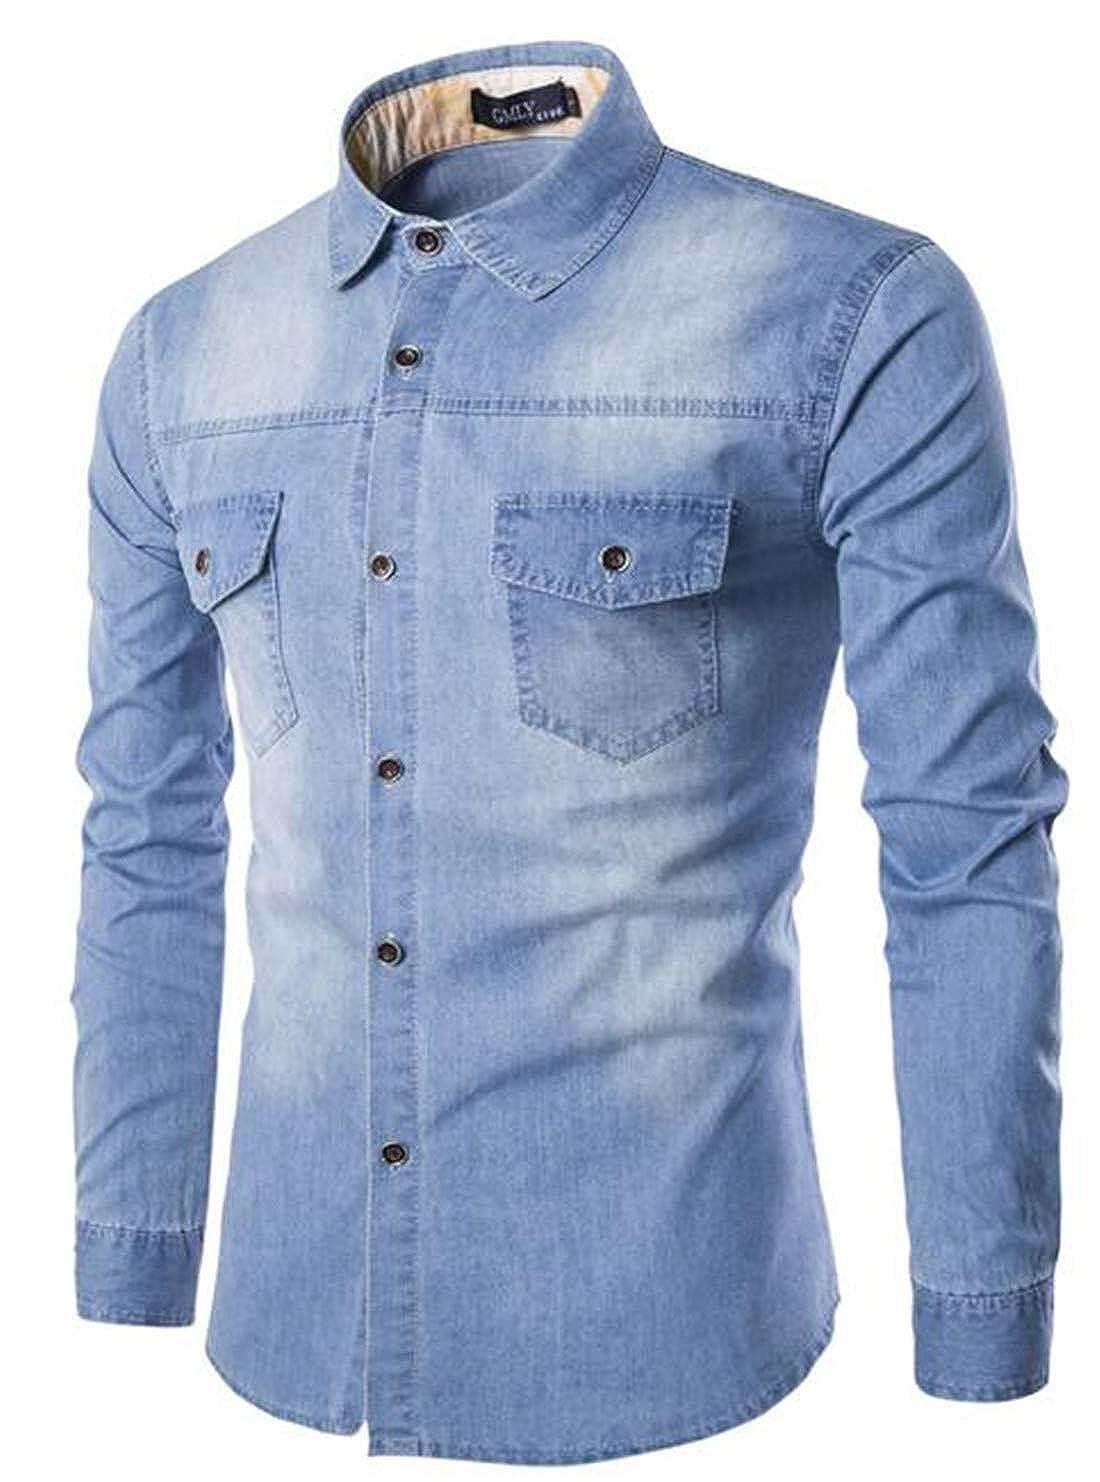 X-Future Mens Pockets Plus Size Long Sleeve Button Up Denim Shirt